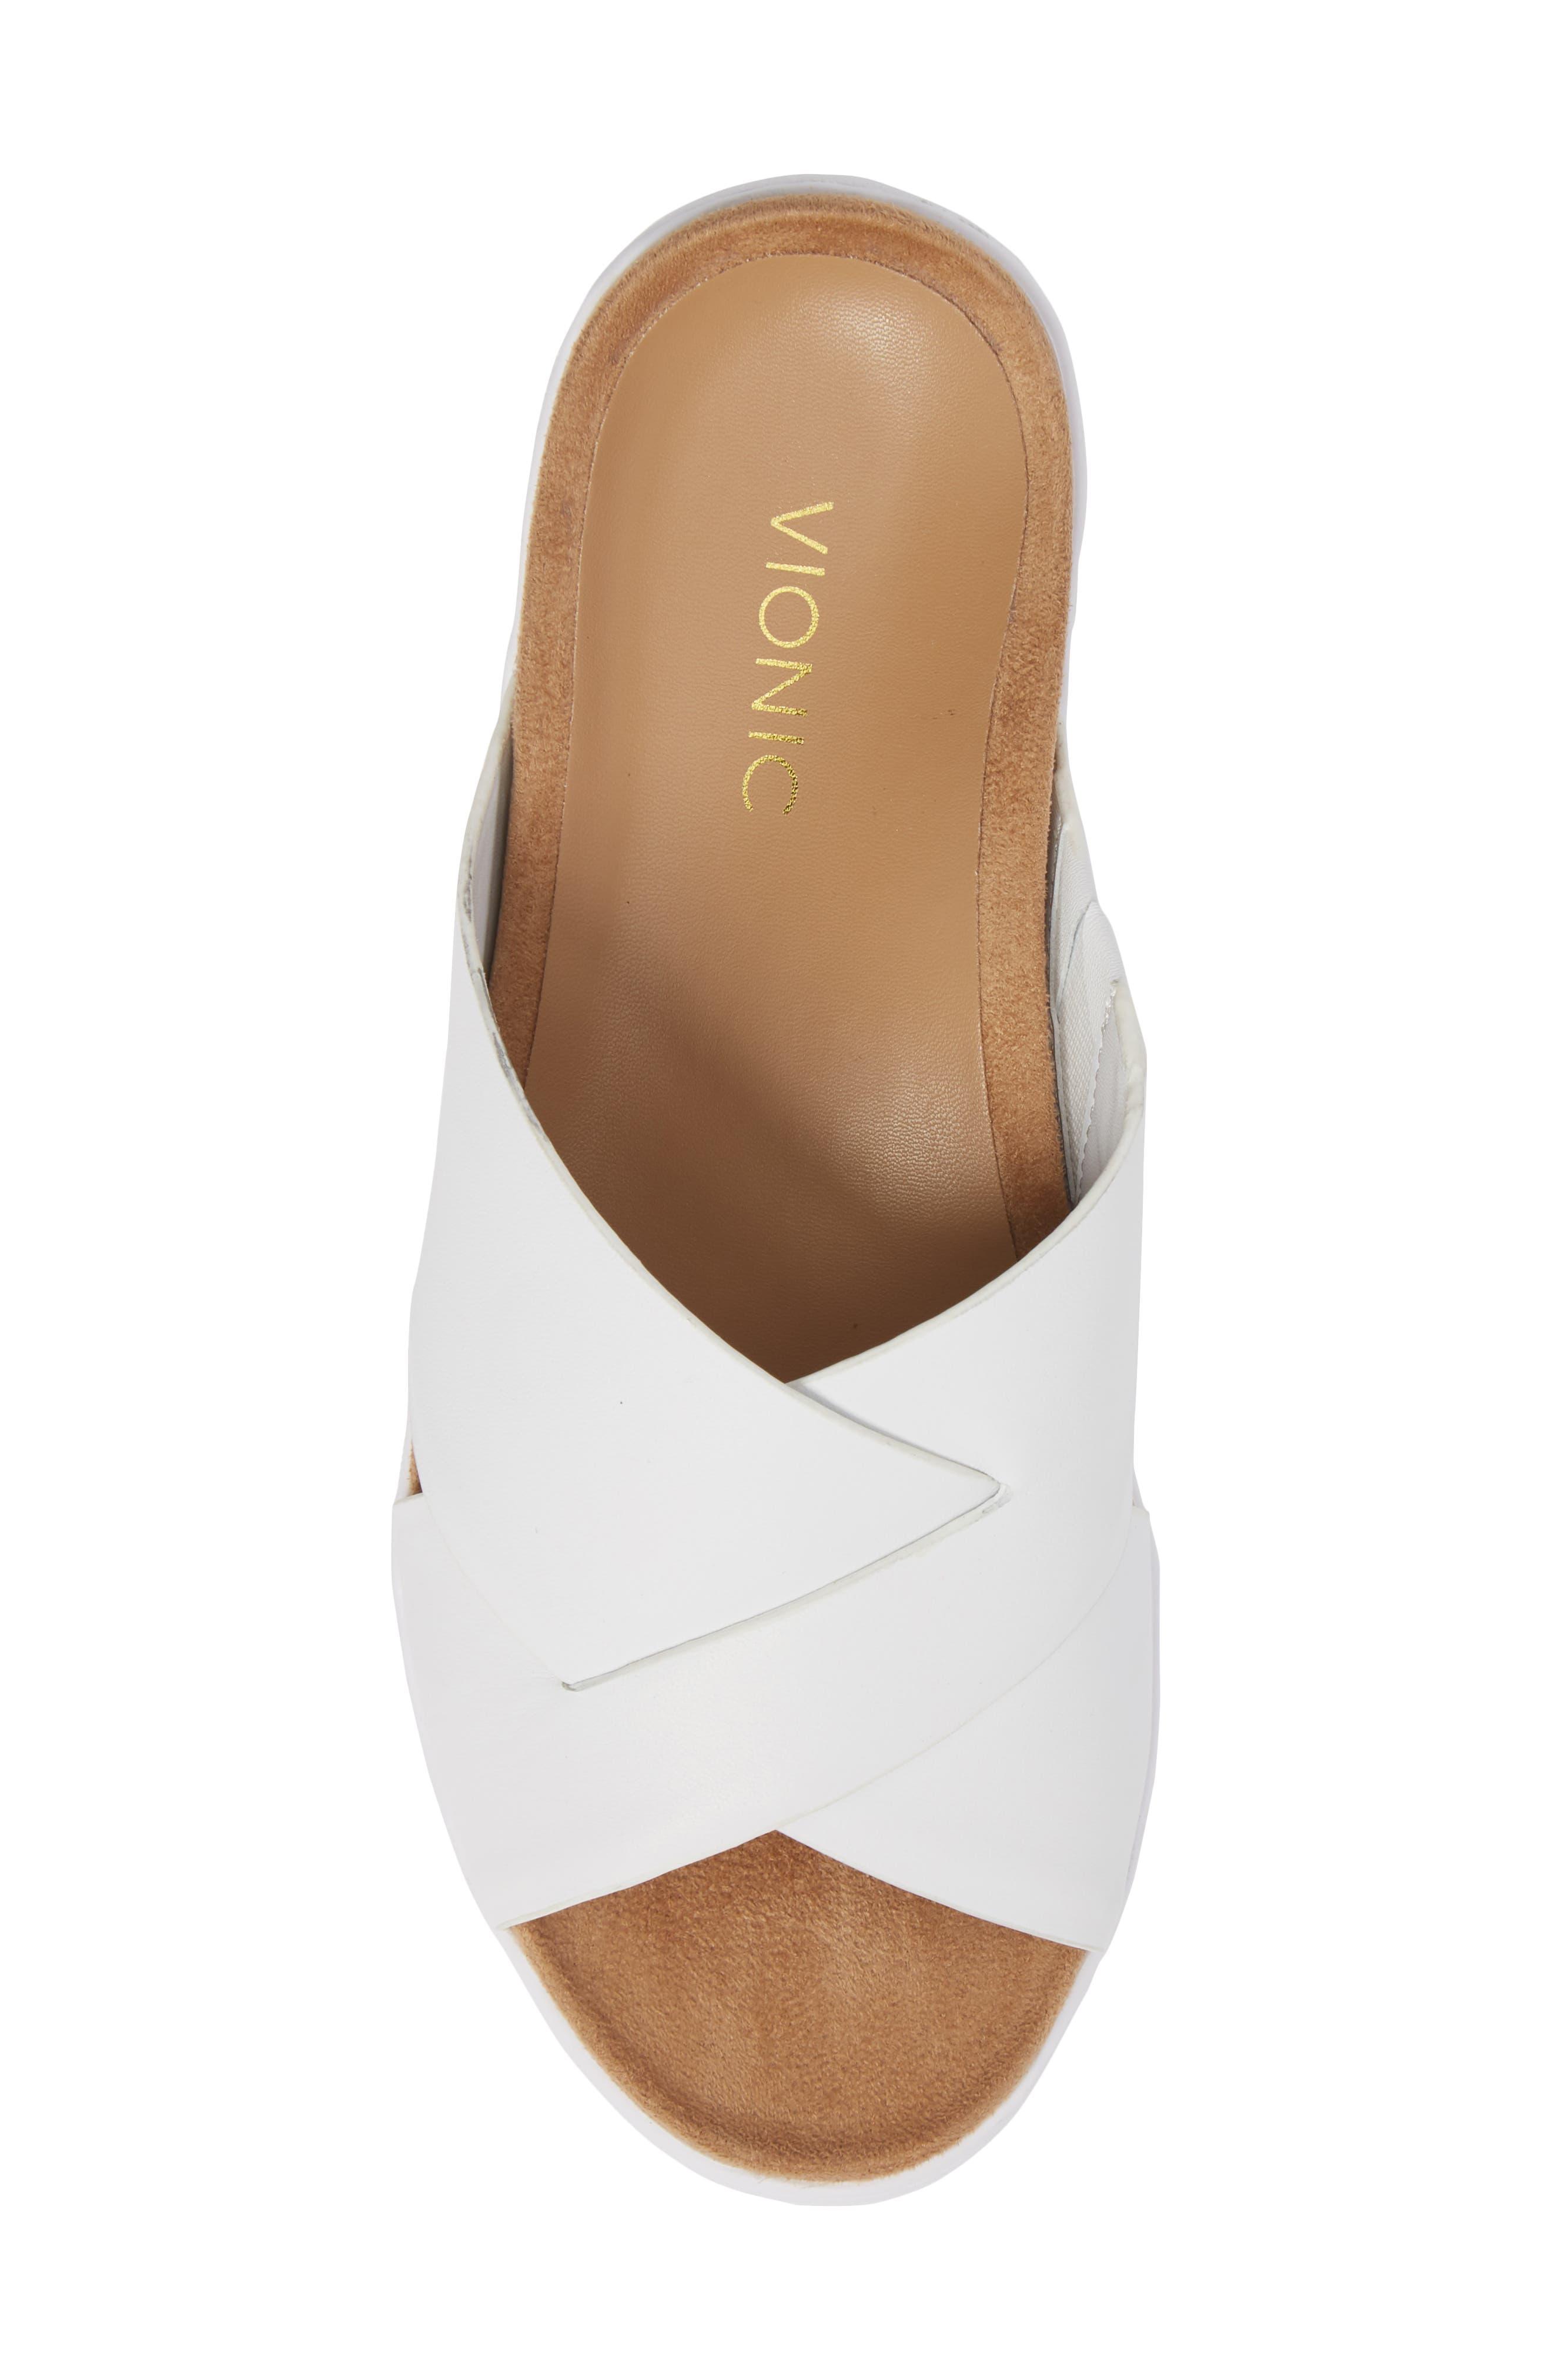 Lou Slide Sandal,                             Alternate thumbnail 5, color,                             White Leather